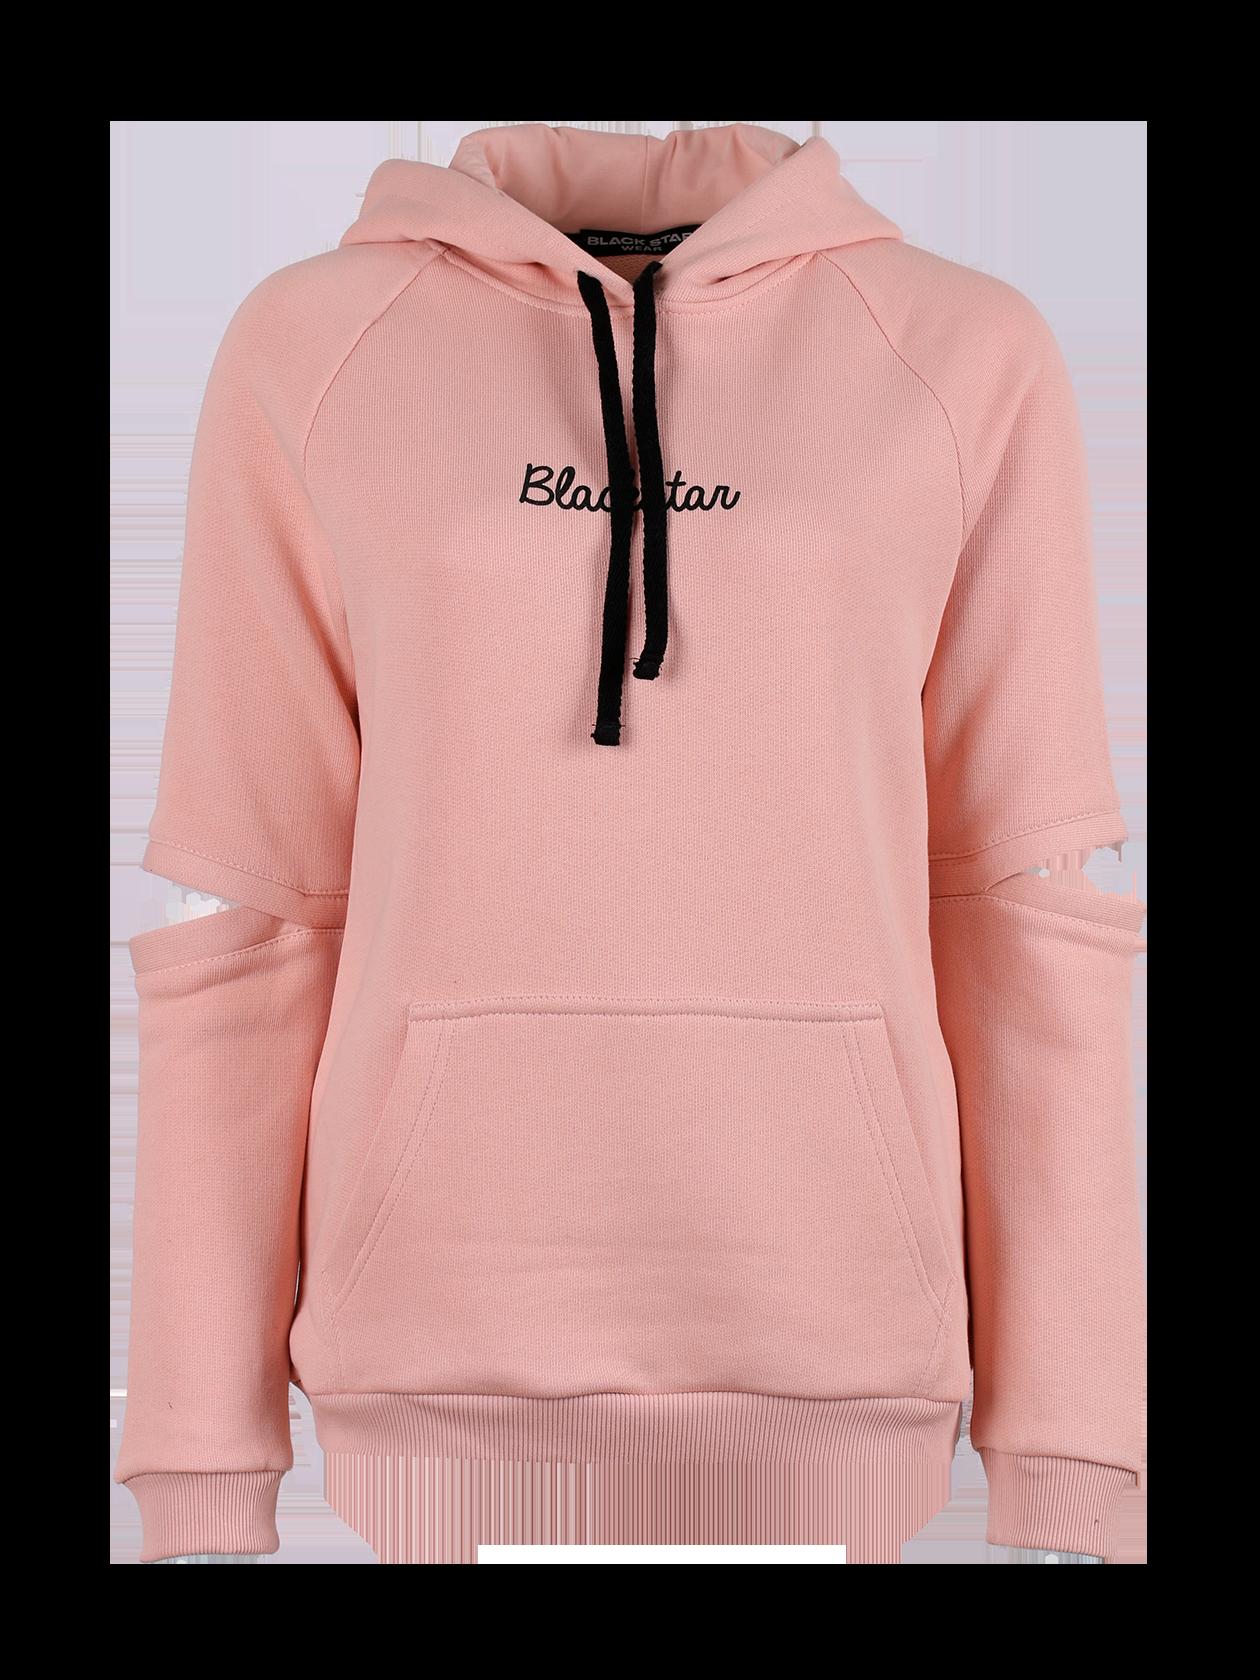 Teens hoodie HOLE BLACK STAR<br><br>size: 12-14 years<br>color: Pink<br>gender: unisex